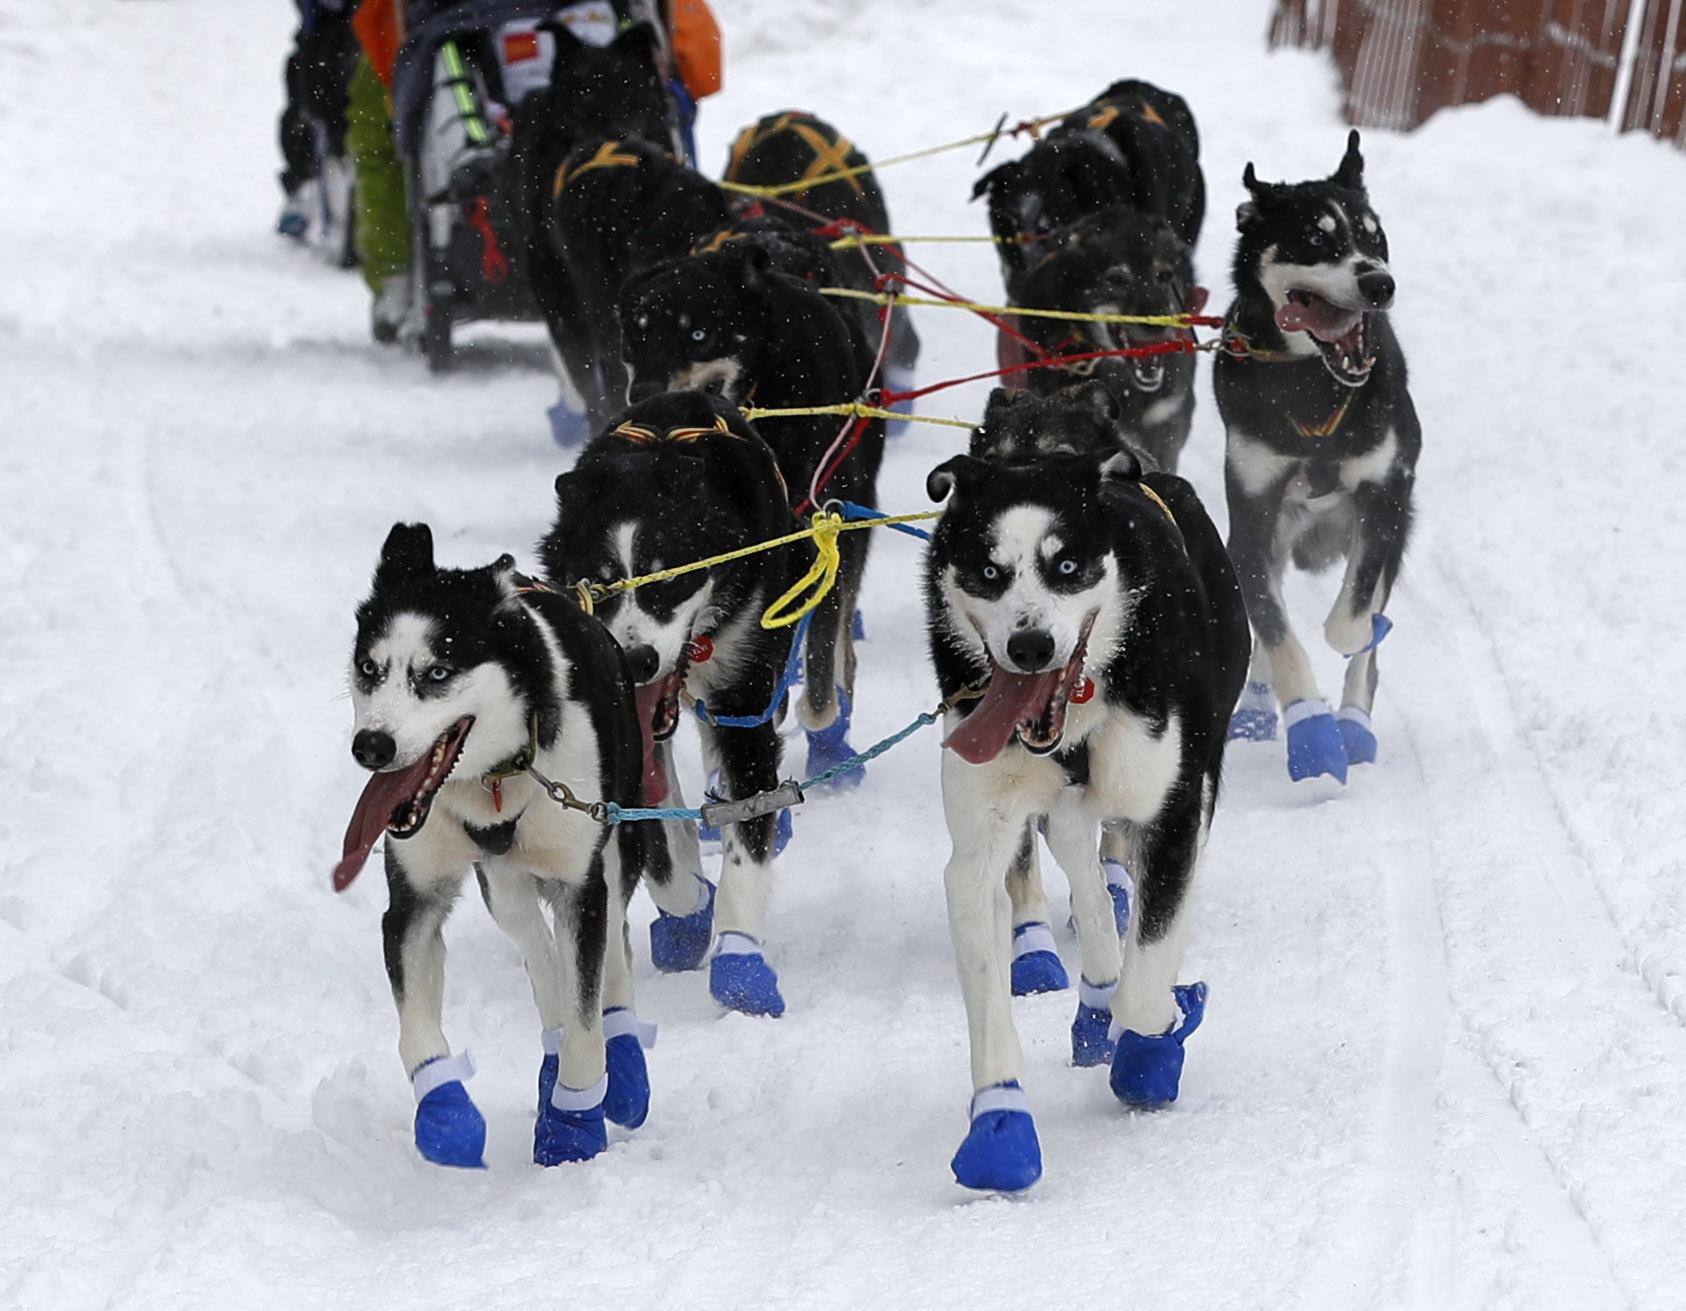 Iditarod Trail Sled Dog Race in Alaska